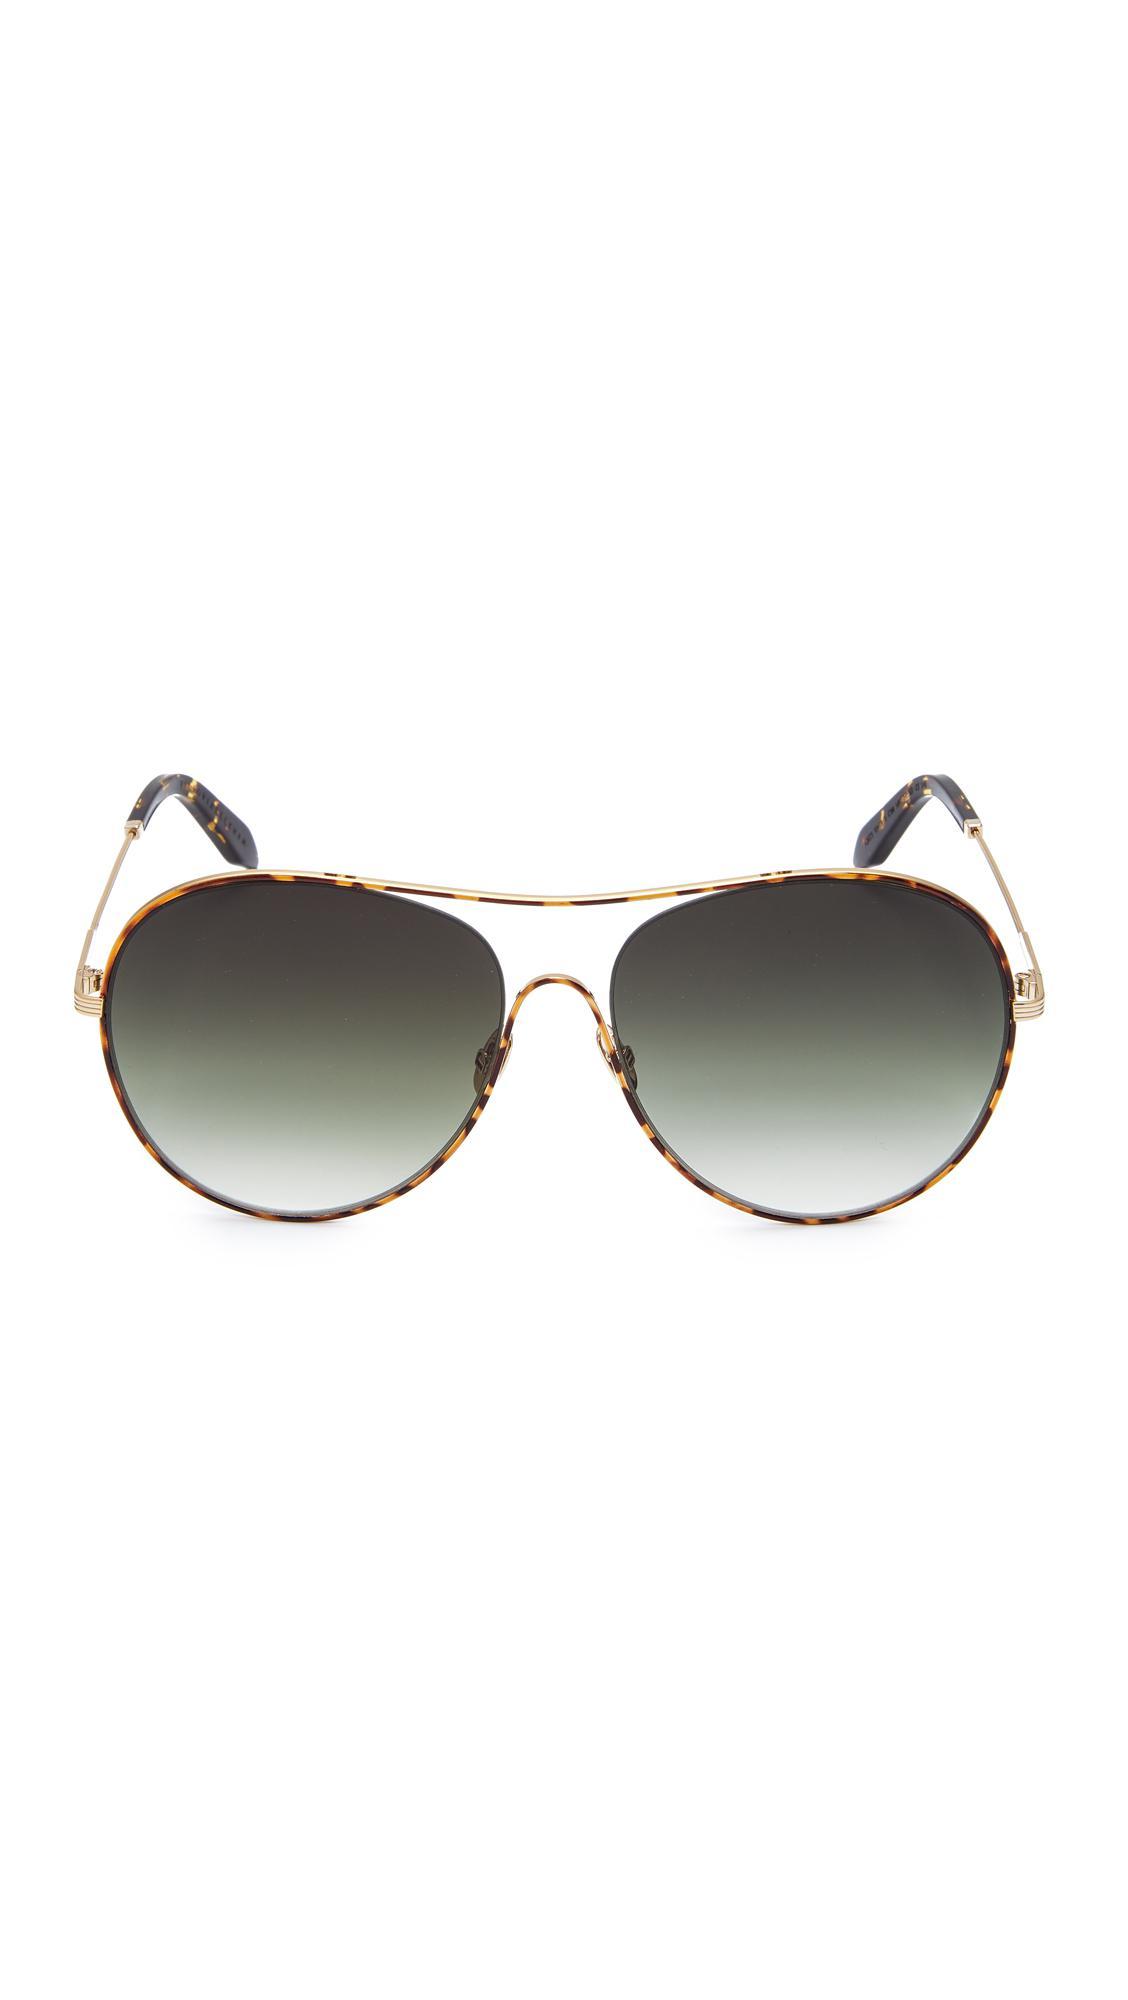 Victoria Beckham Loop Round Aviator Sunglasses in Brown